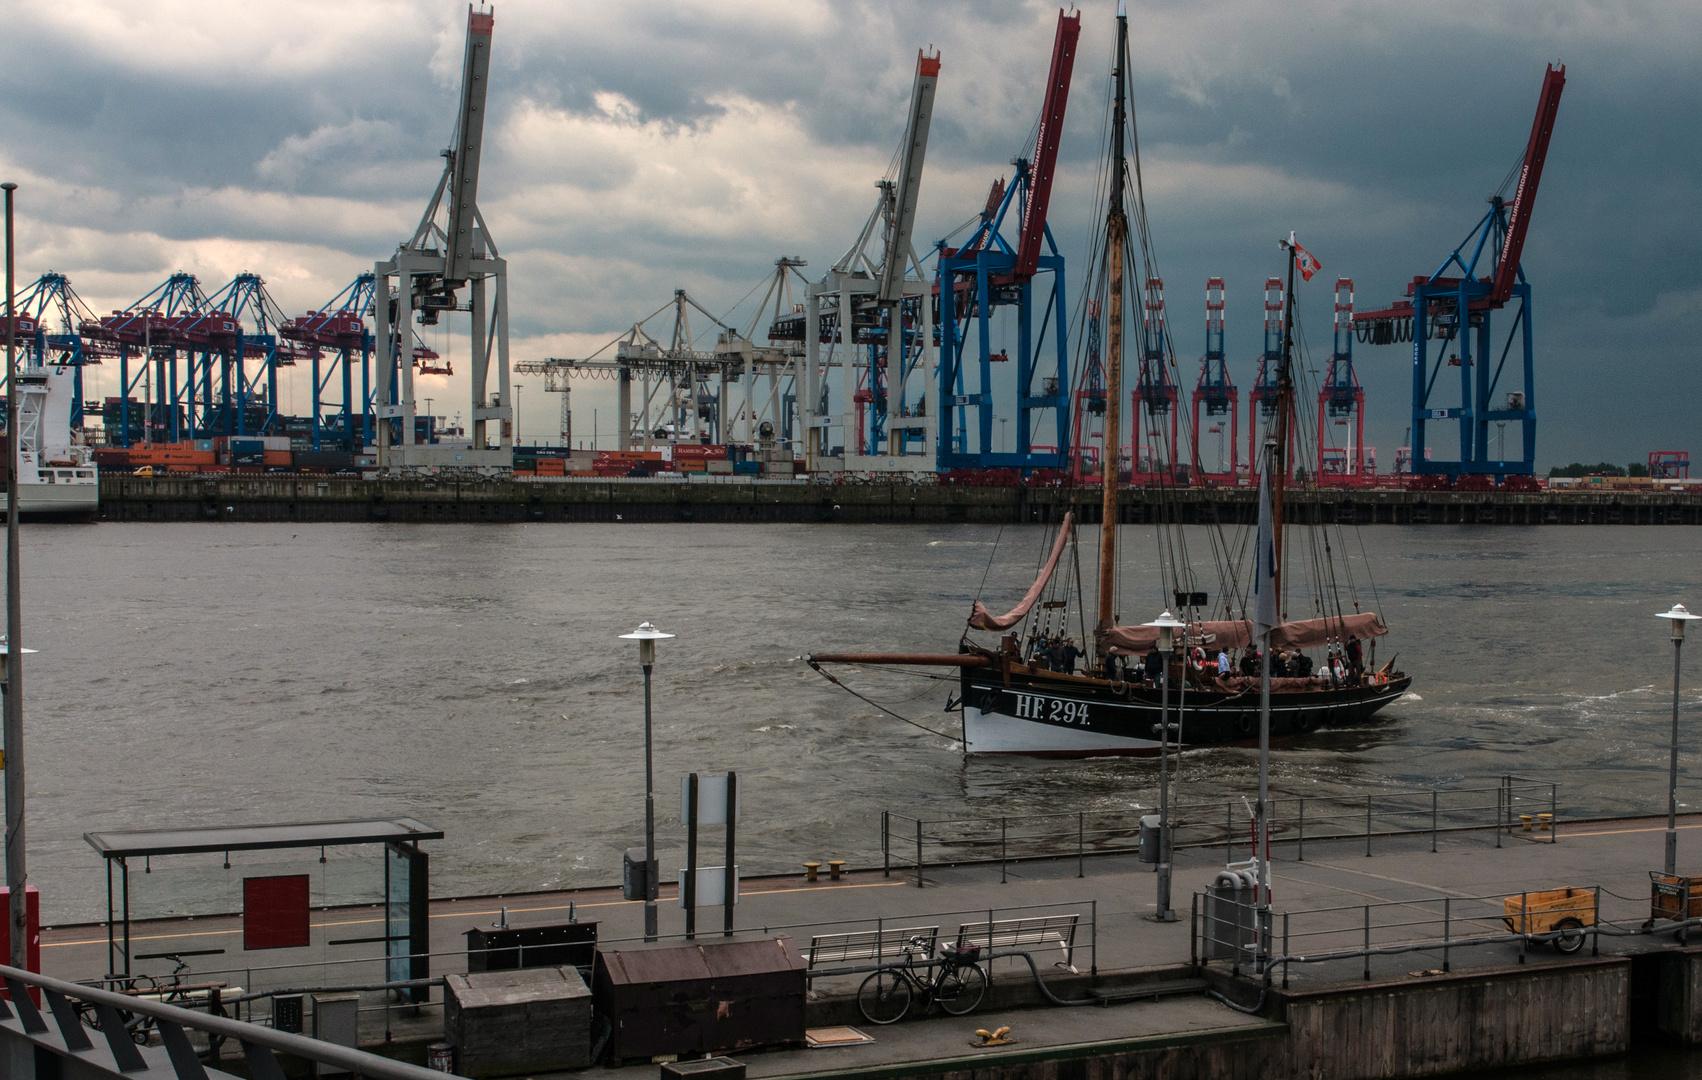 Coming home to good old Hamburg